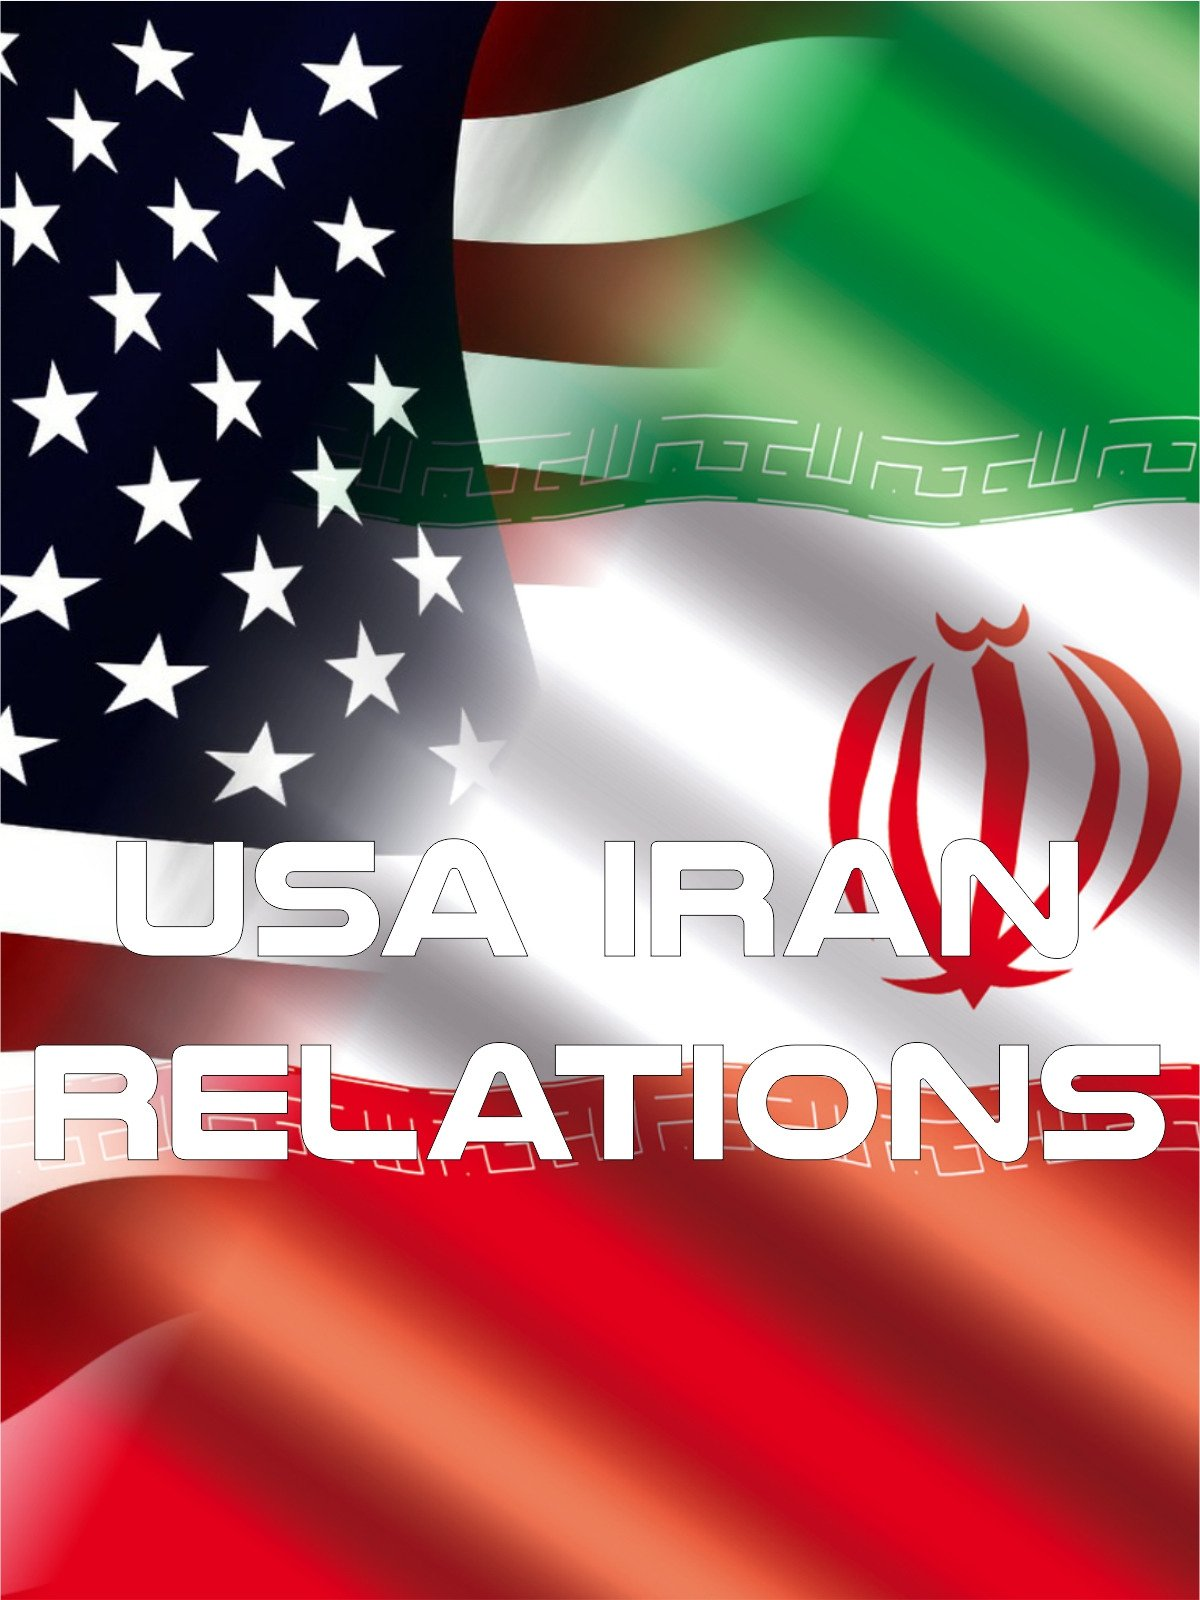 USA Iran Relations